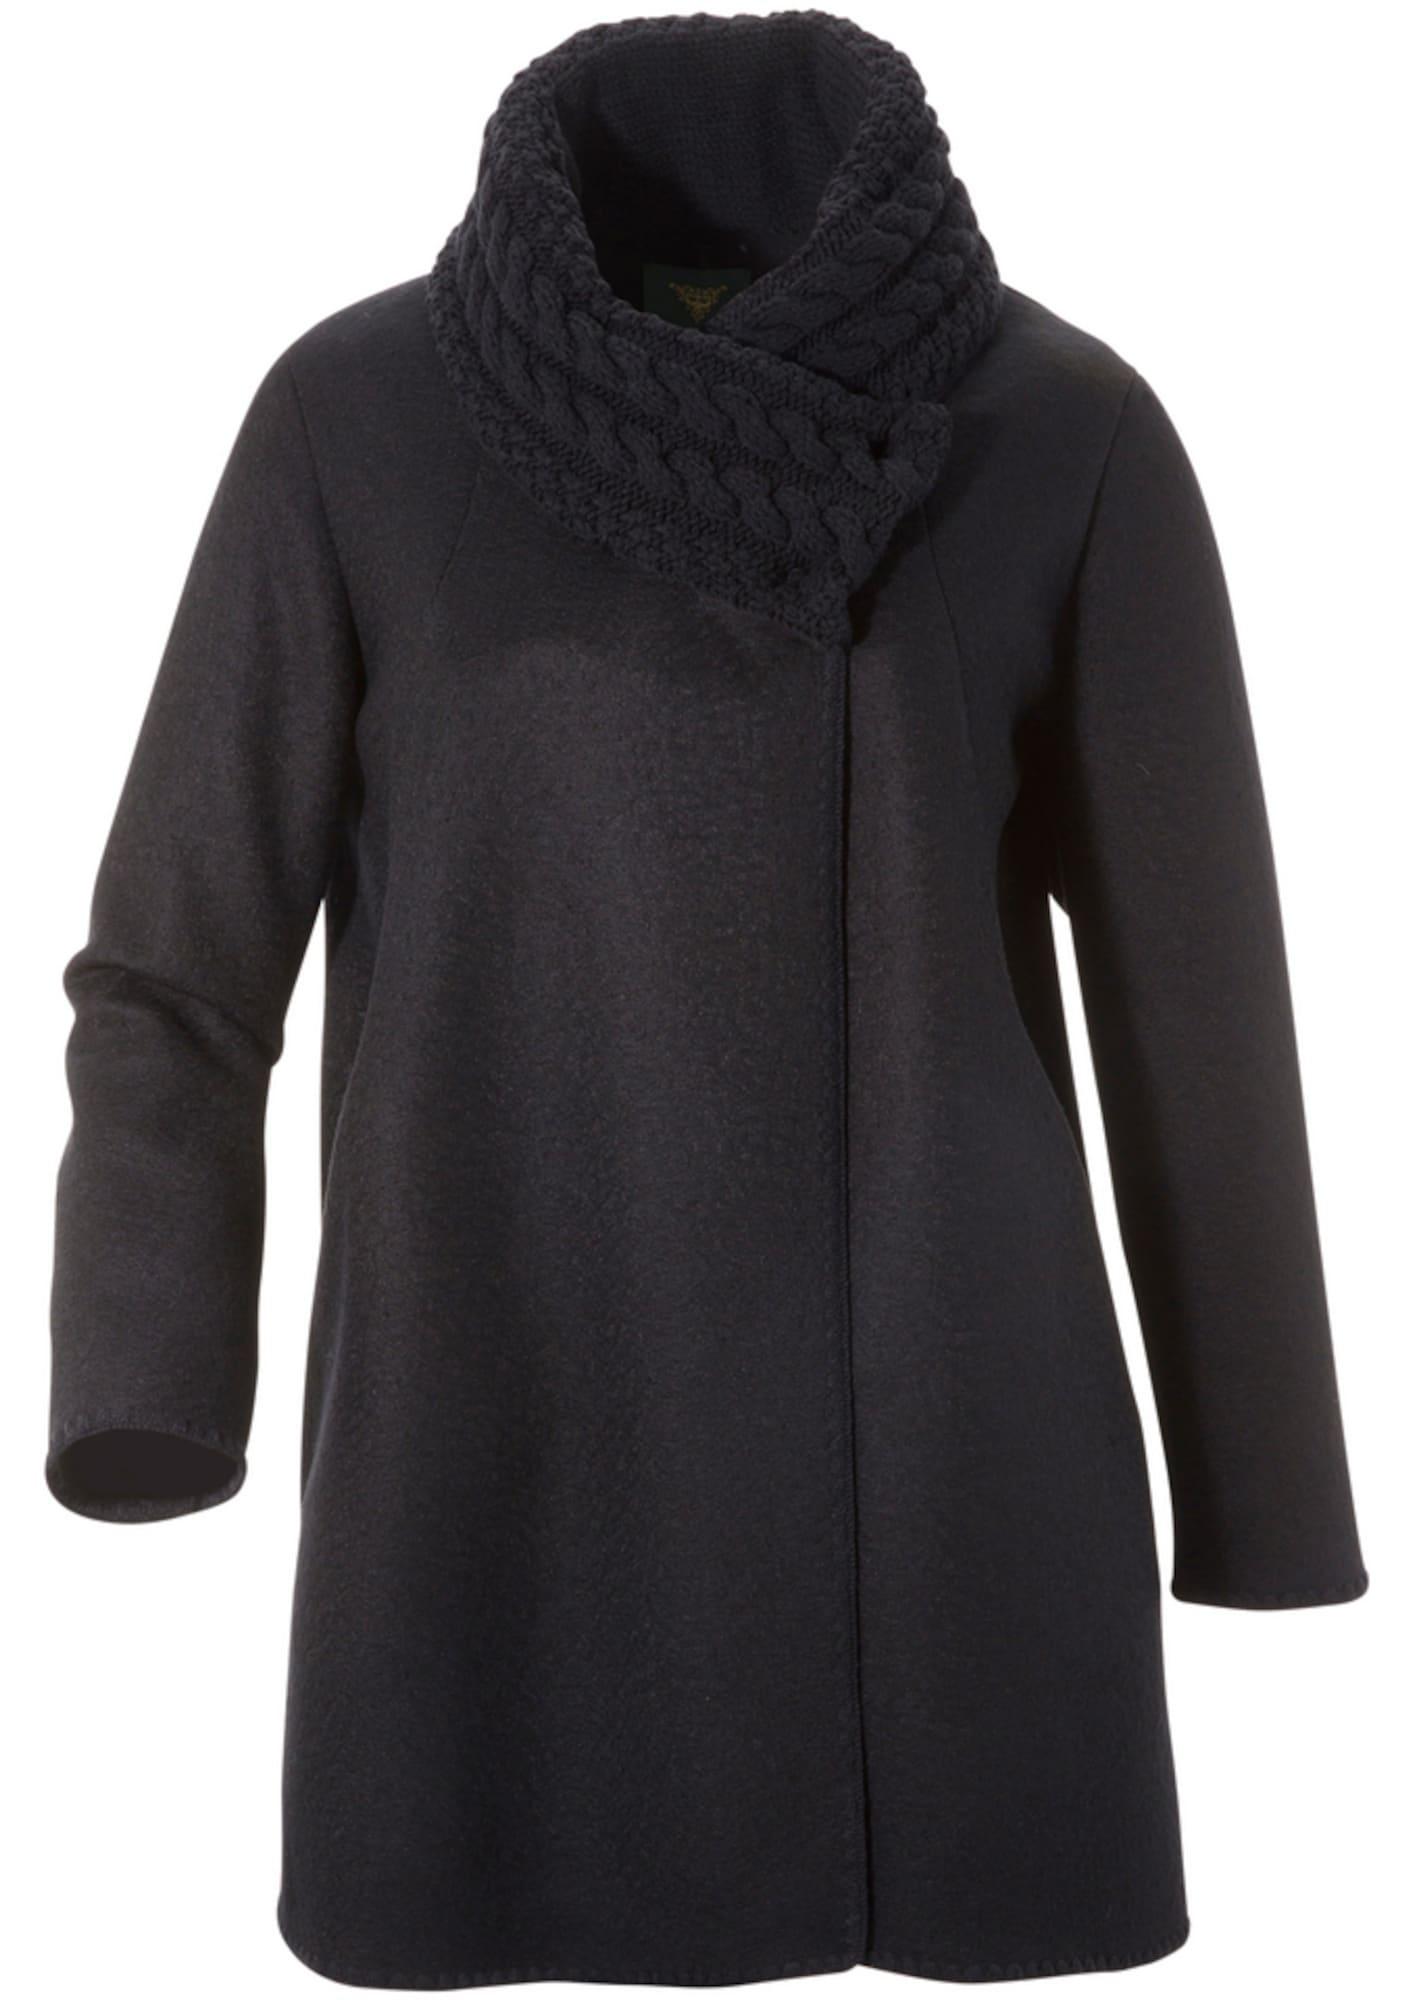 Trachtenponcho | Bekleidung > Pullover > Ponchos & Capes | Schwarz | H.Moser